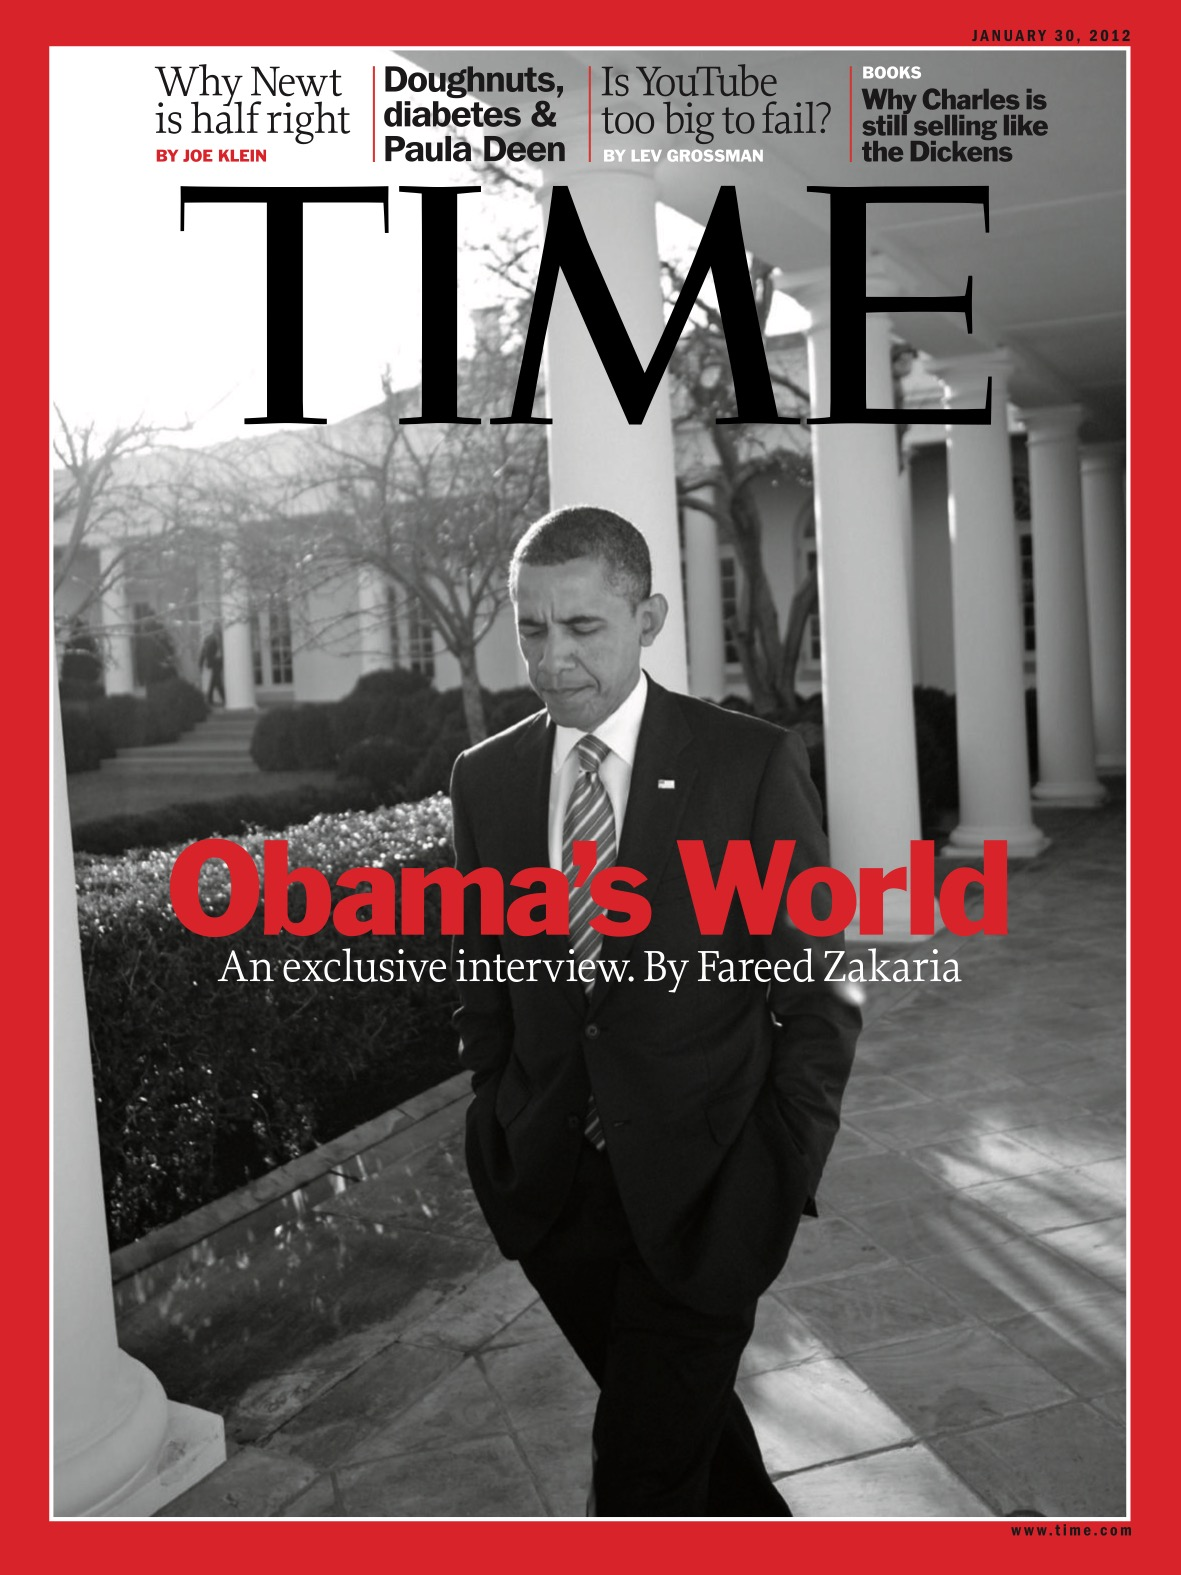 TIME_20120130_CV1_638139_C1.jpeg